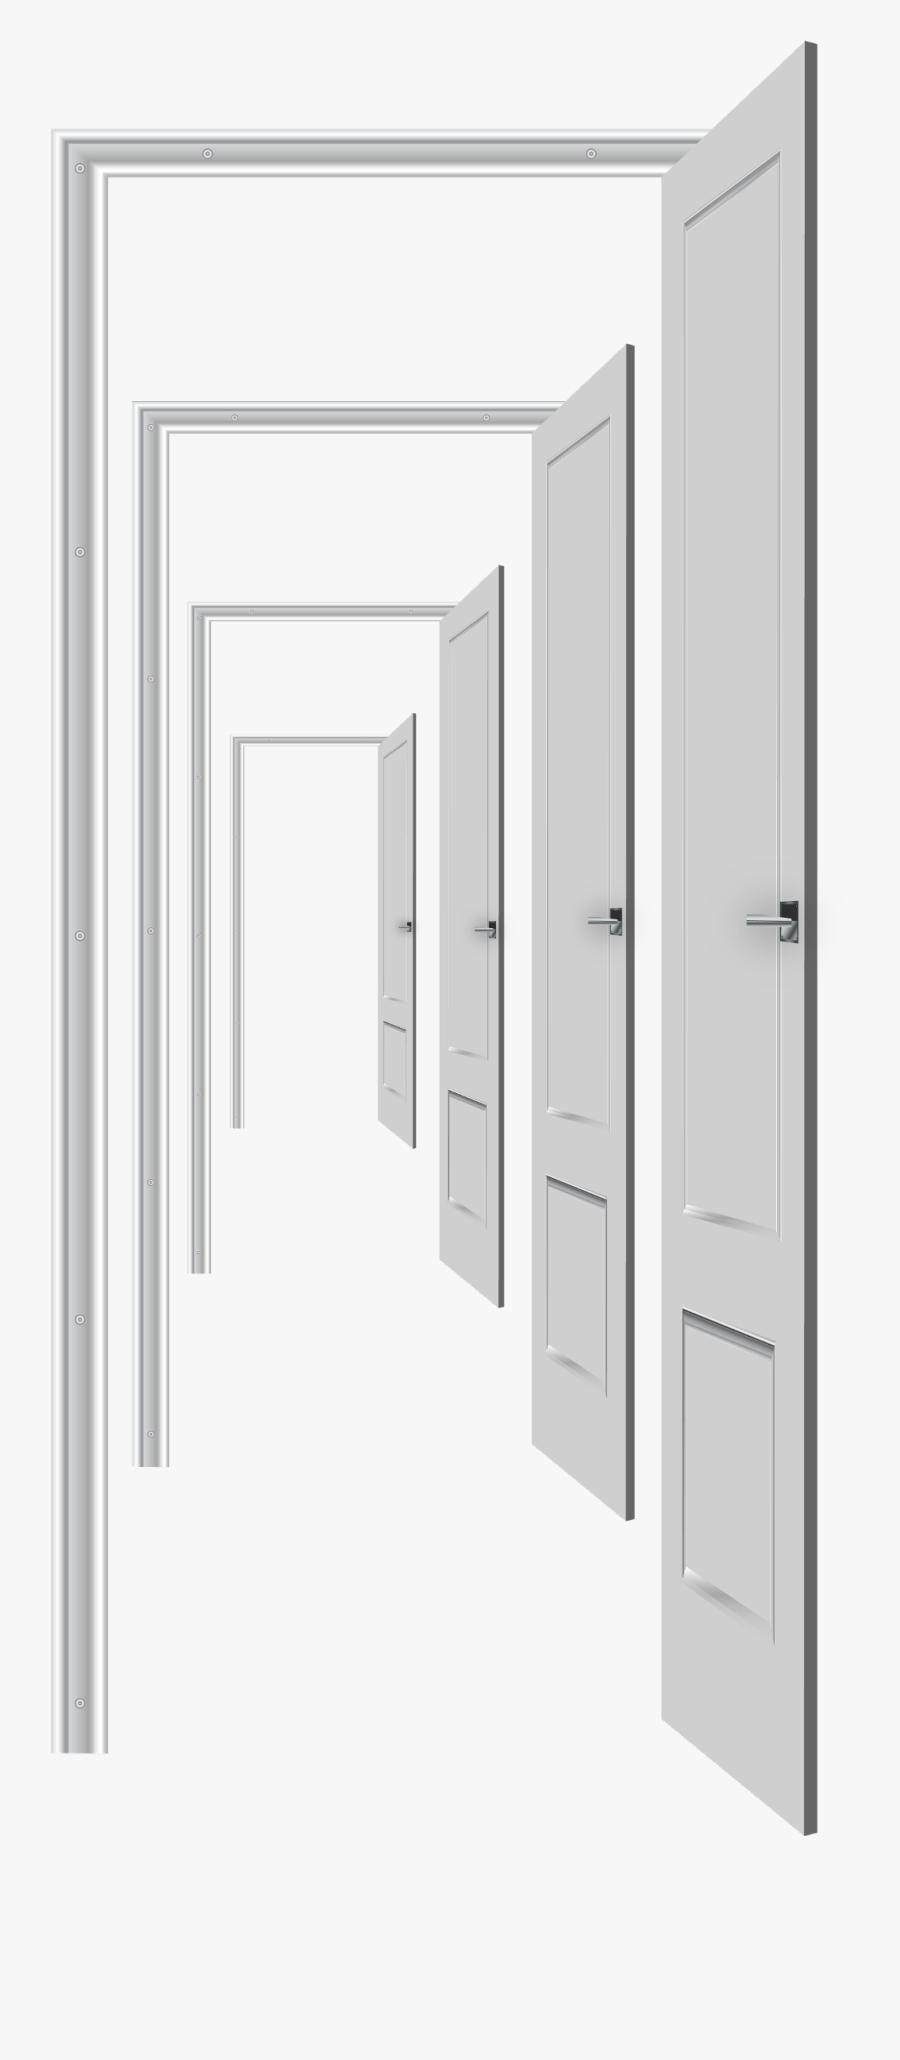 #door#open Door#gate - Porta Aberta Em Png, Transparent Clipart